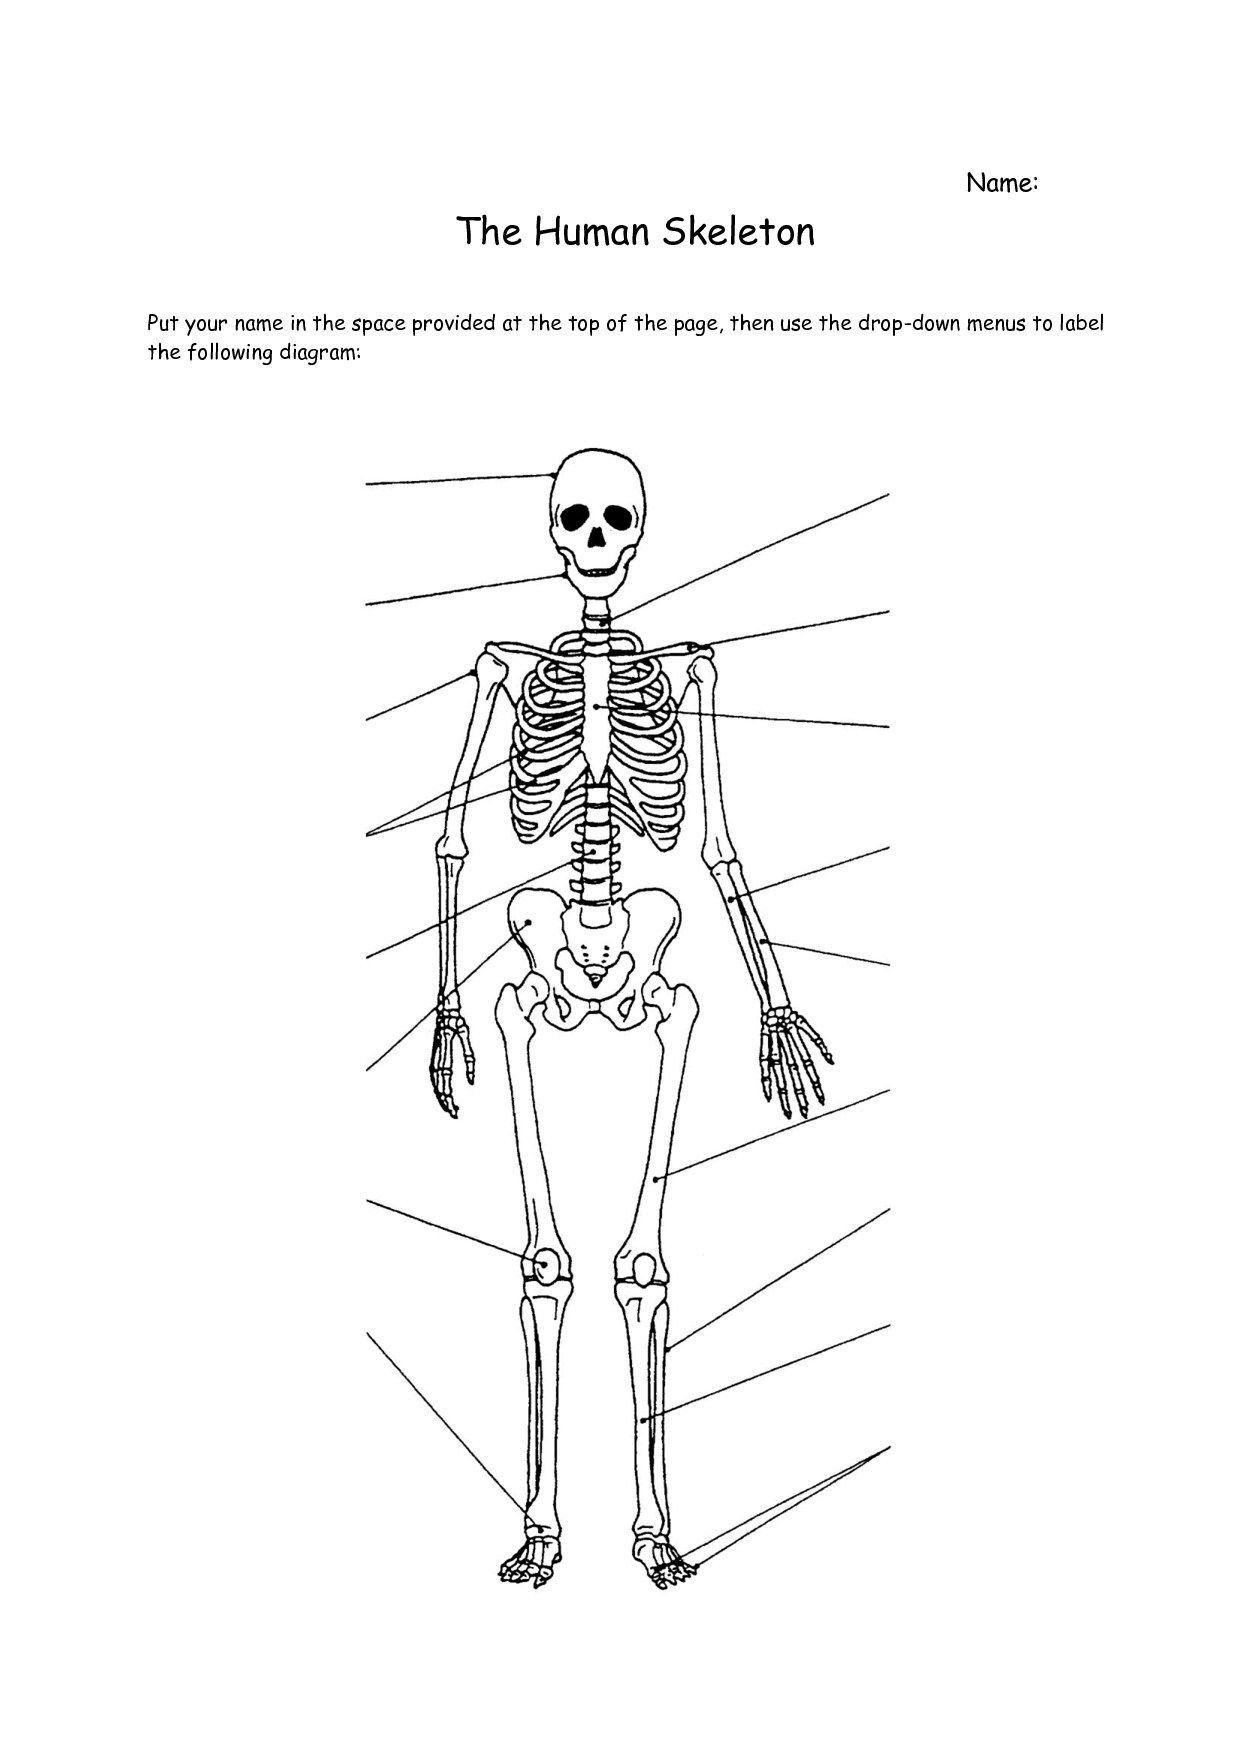 Appendicular Skeleton Worksheet Answers Human Skeleton Diagram Unlabeled Human Skeleton Diagr In 2020 Skeletal System Worksheet Worksheet Template Printable Worksheets